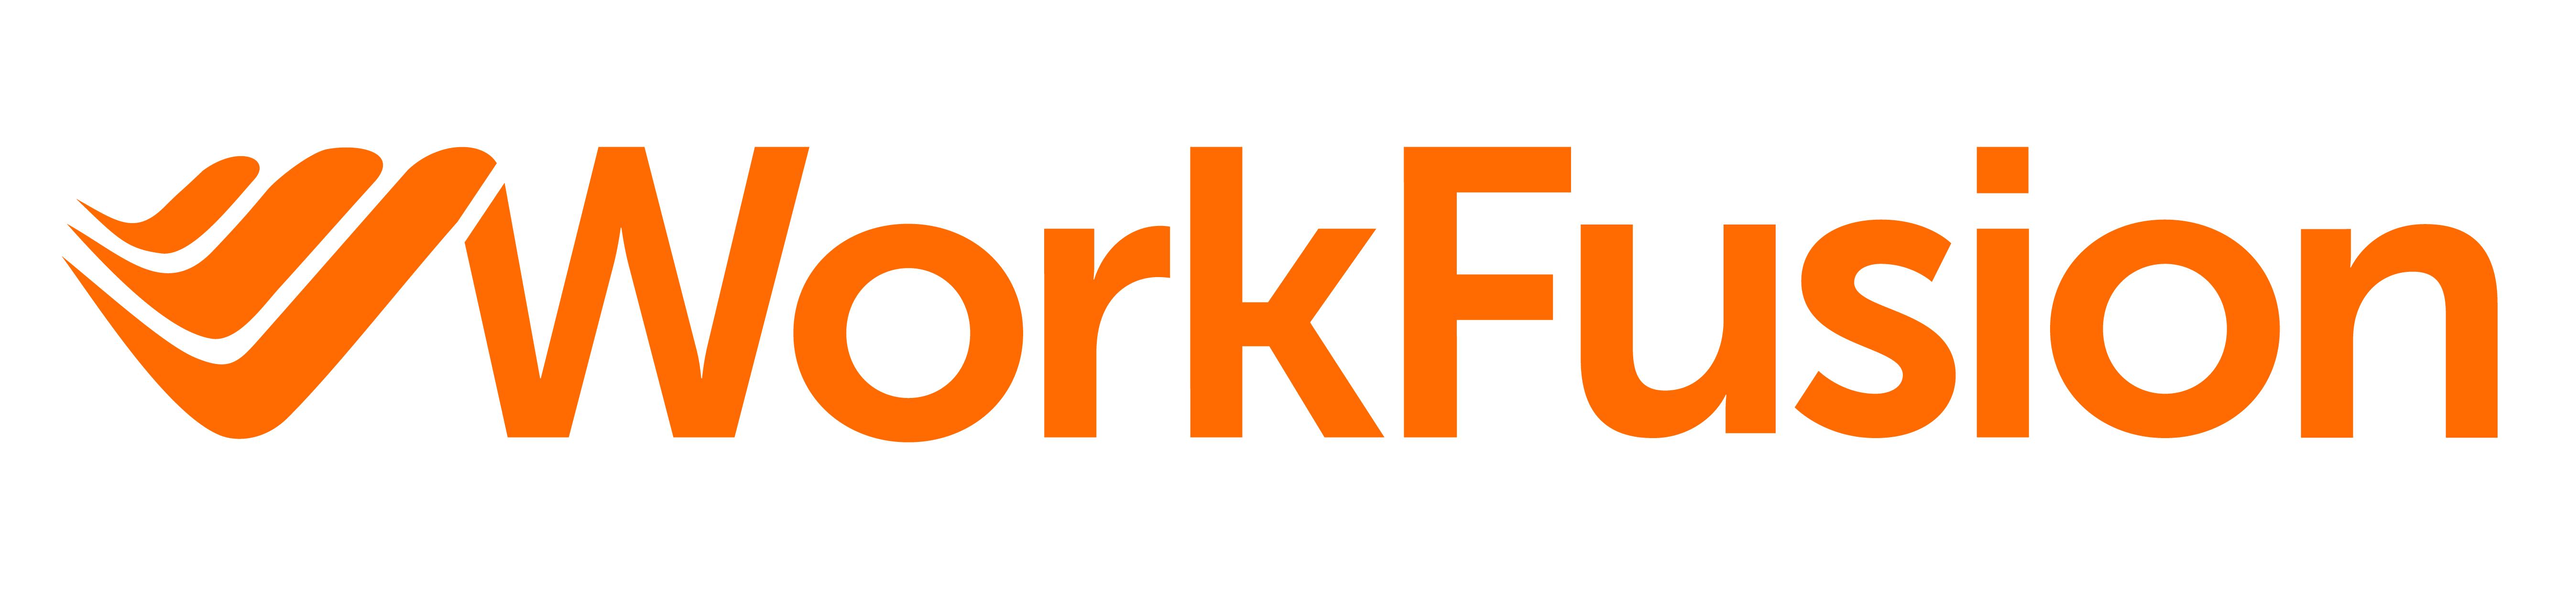 WorkFusion-rpa